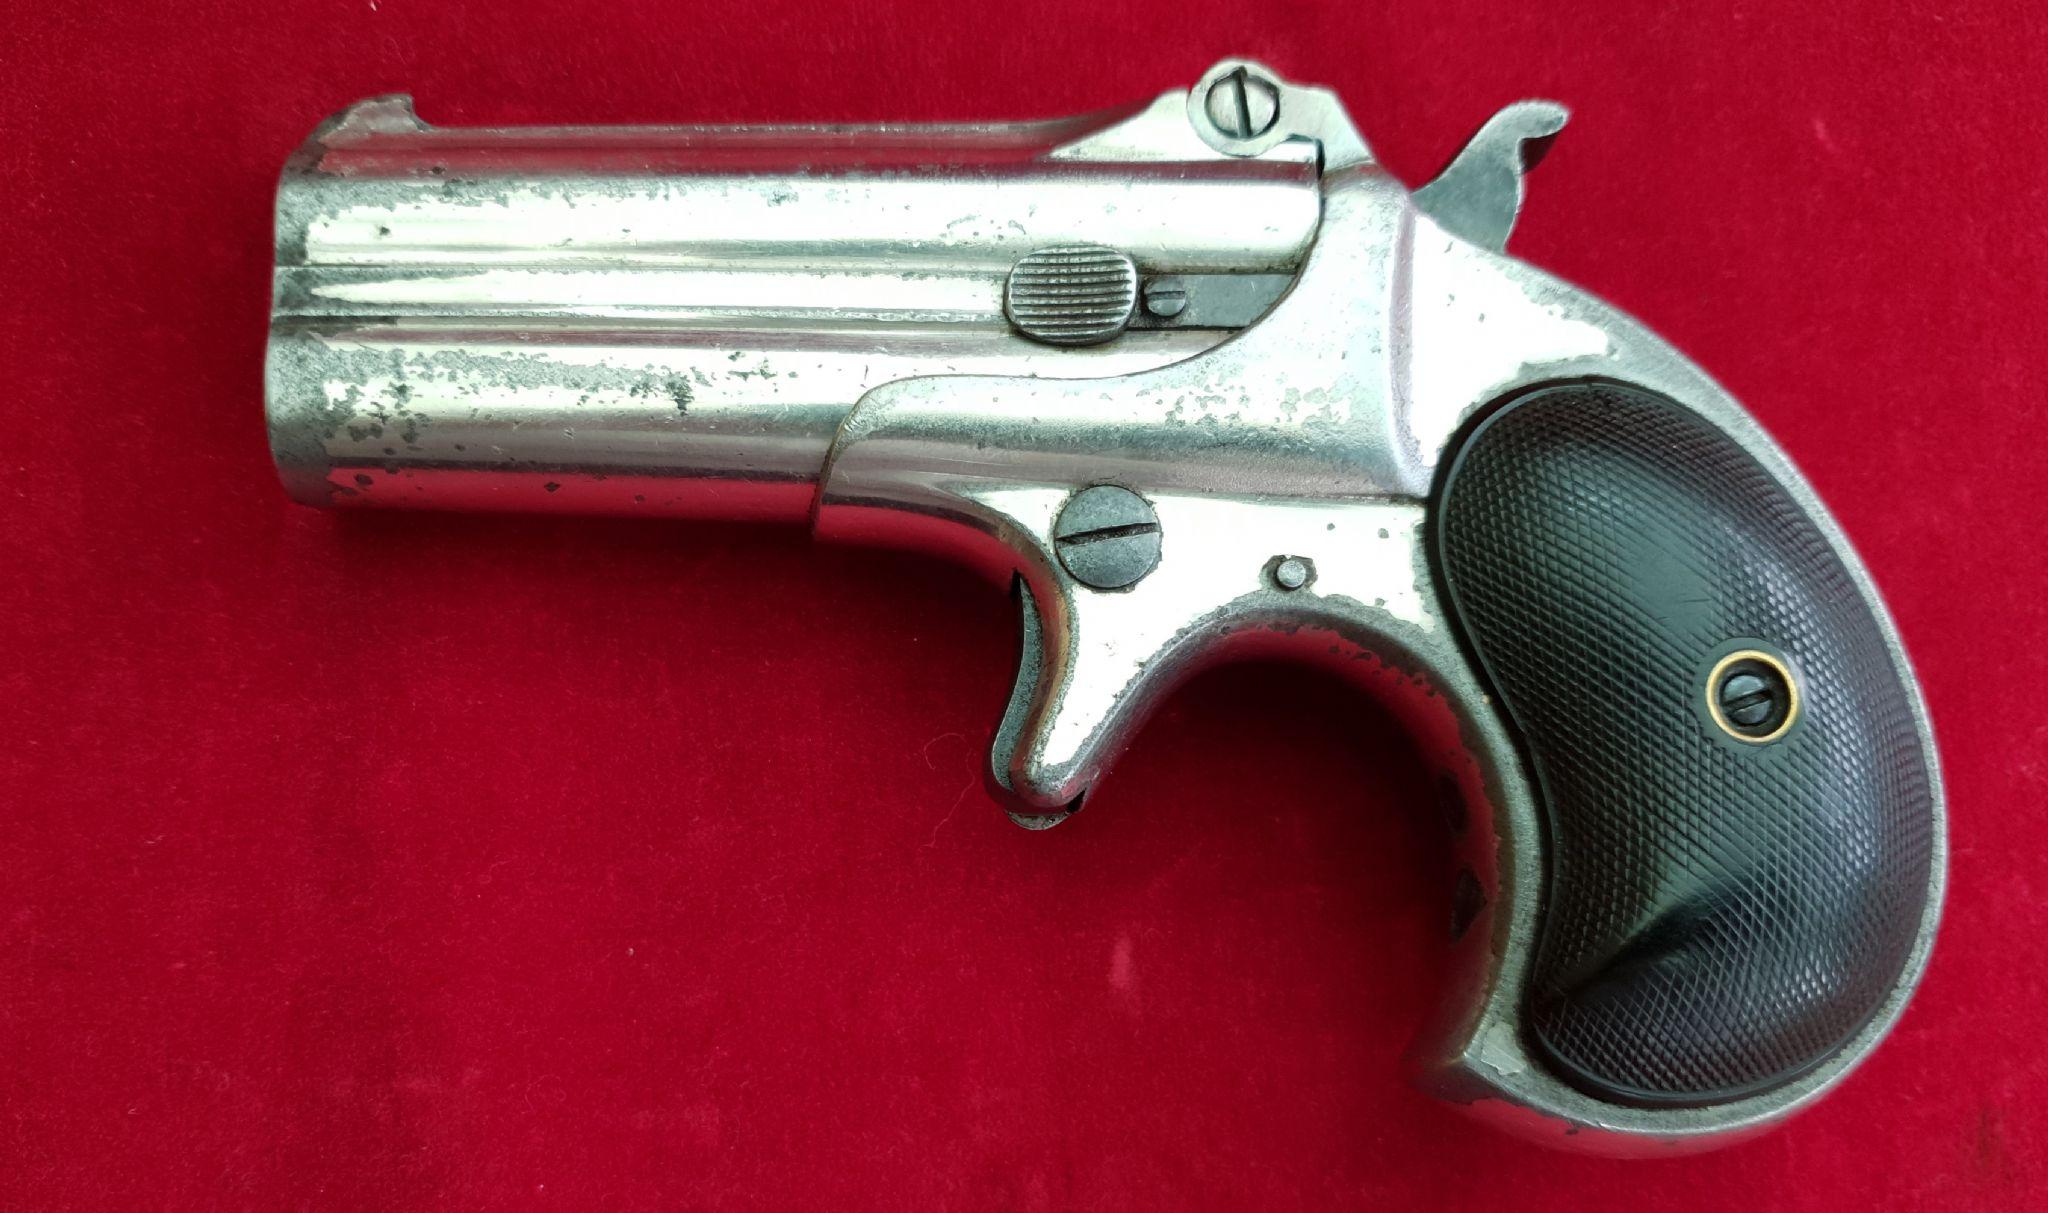 A scarce Remington  41 rim-fire double barrel over and under Gambler